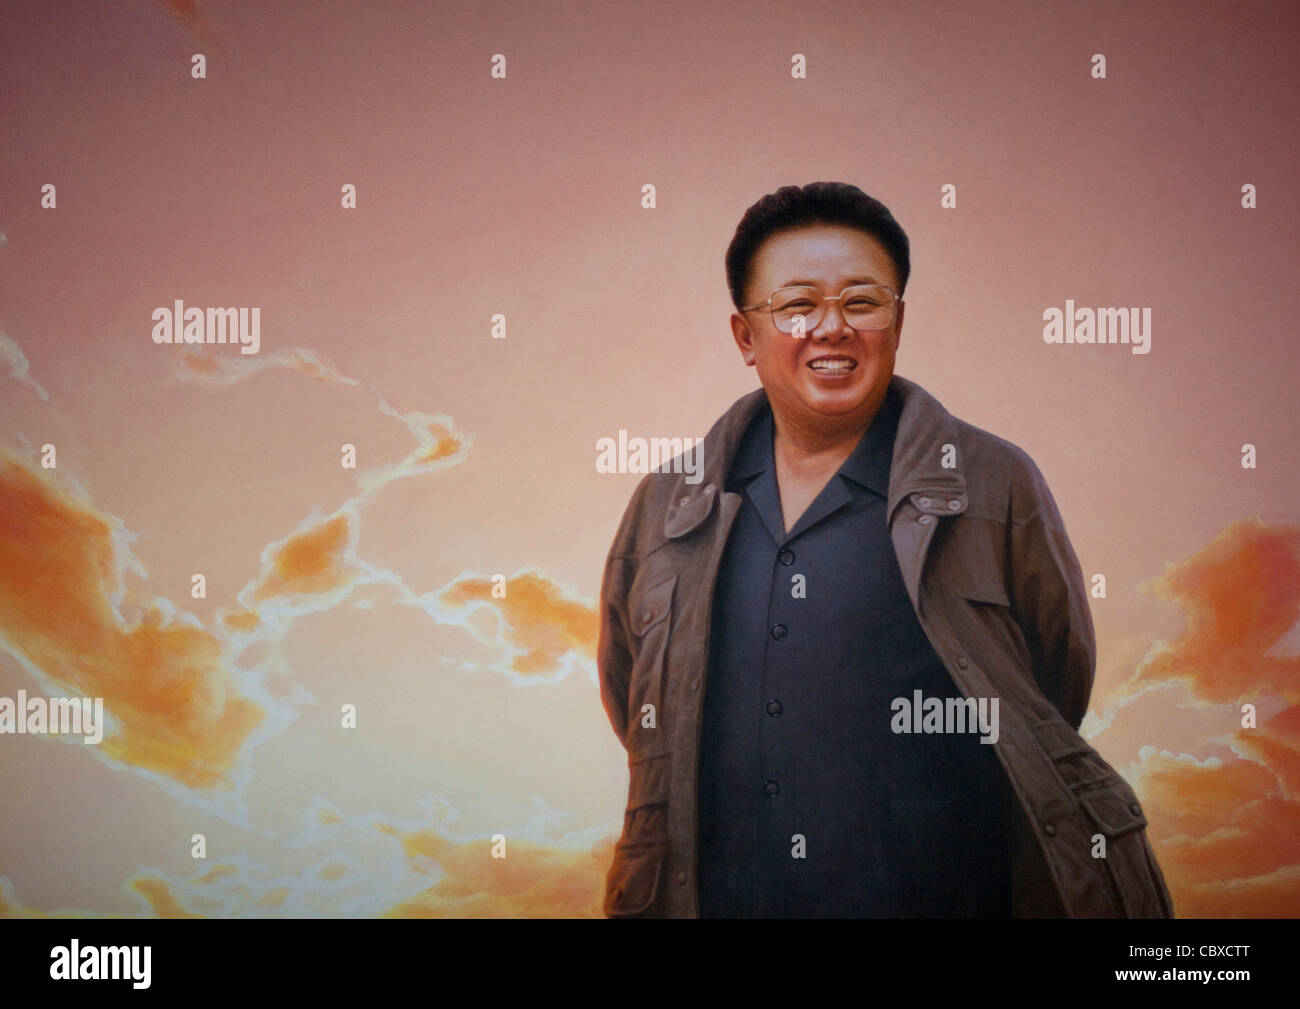 KIM JONG IL ON A PROPAGANDA POSTER, NORTH KOREA - Stock Image